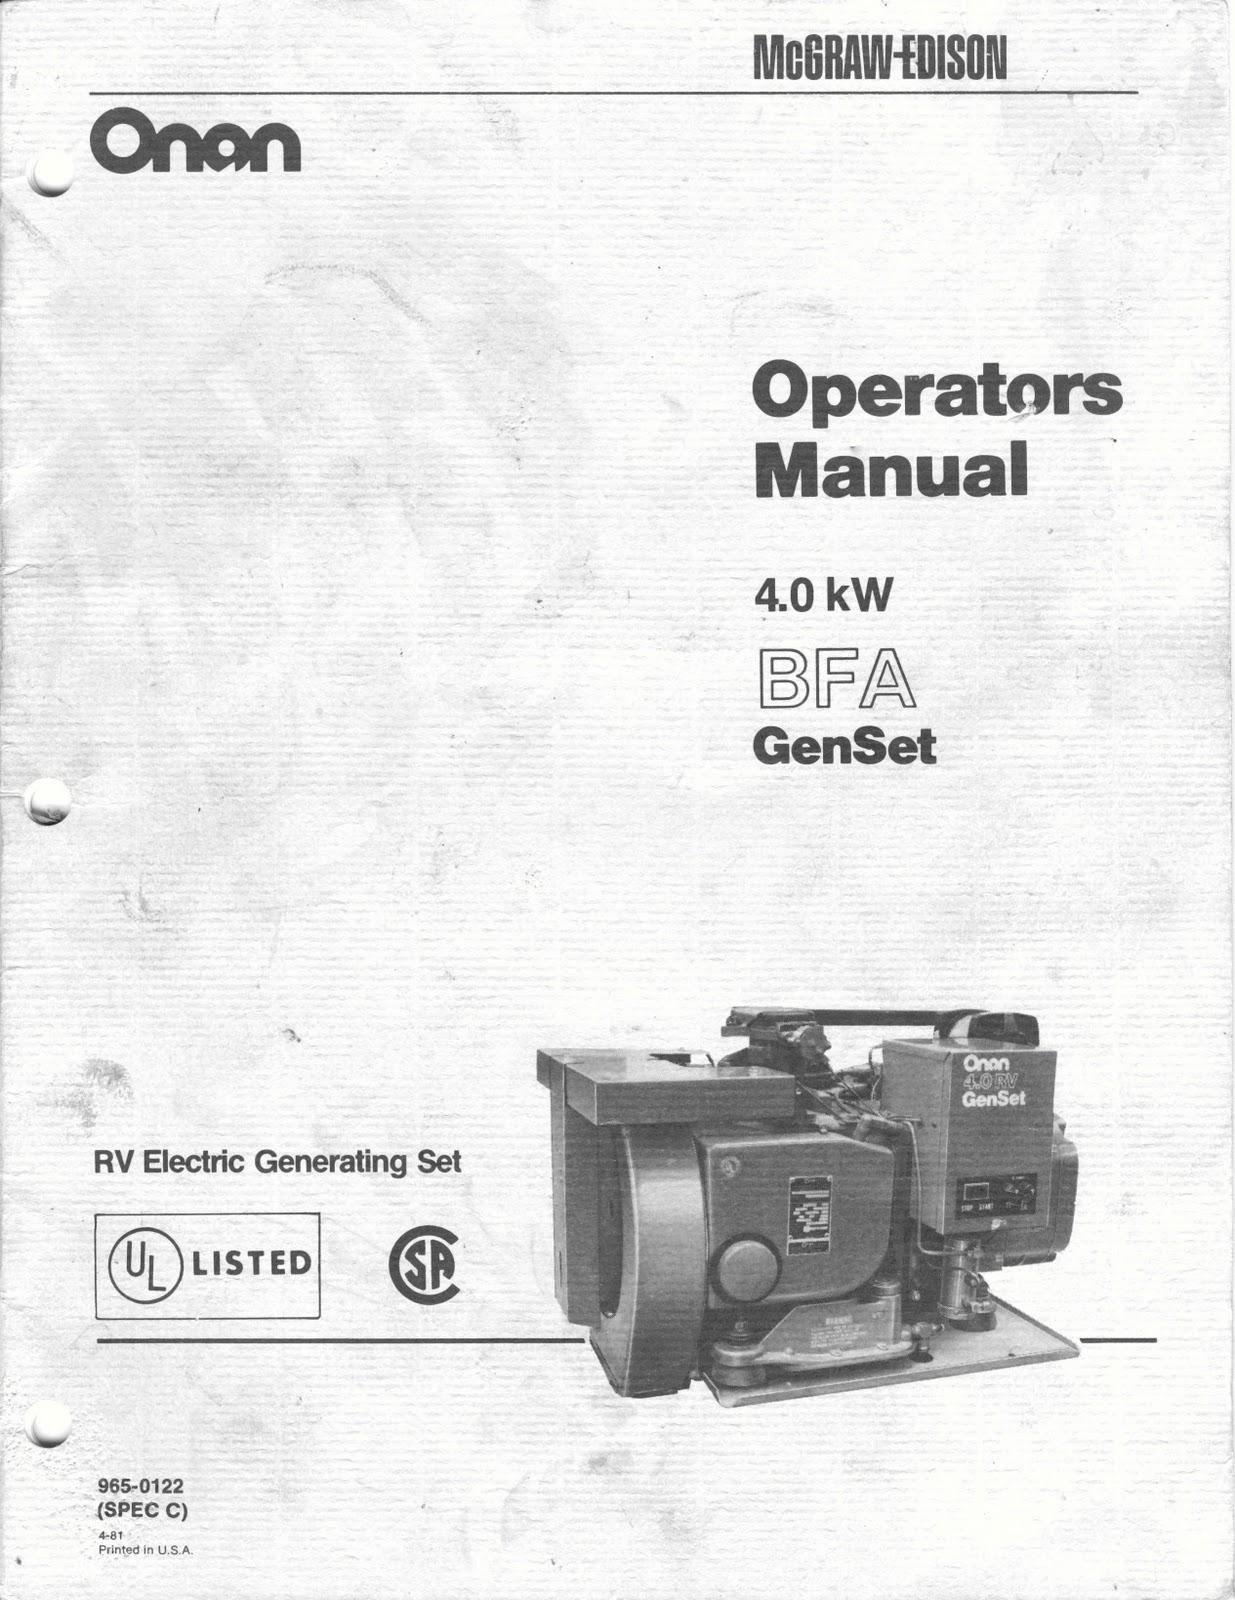 wiring diagram onan genset 12v spdt relay 1983 fleetwood pace arrow owners manuals 4 0 kw bfa operators manual